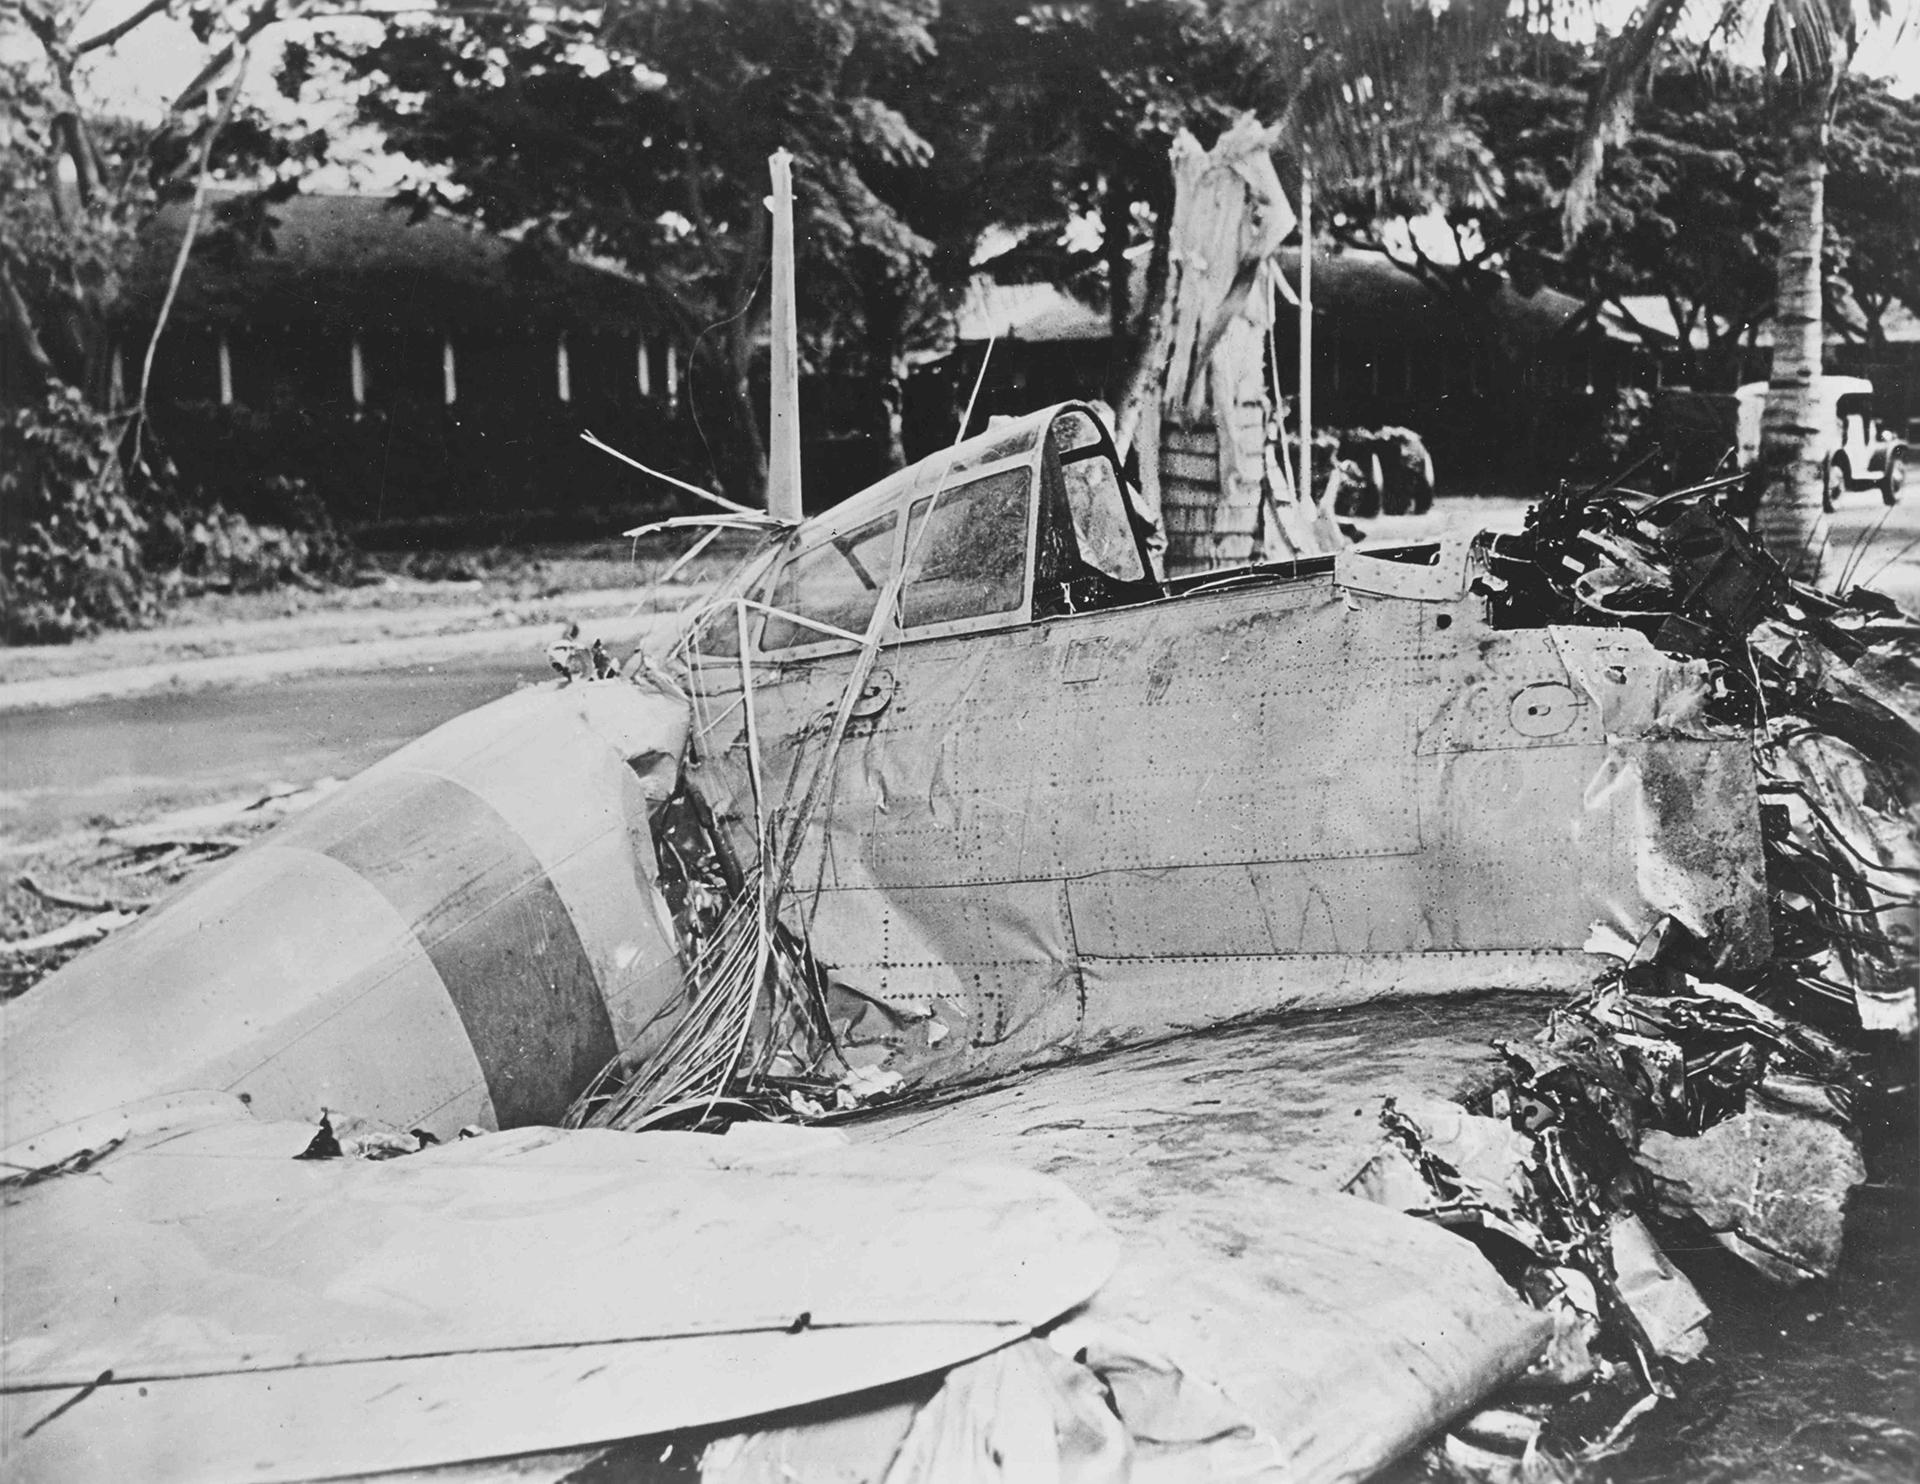 Un 00 japonés estrellado durante el ataque en Fort Kamehameha, cerca de Pearl Harbor